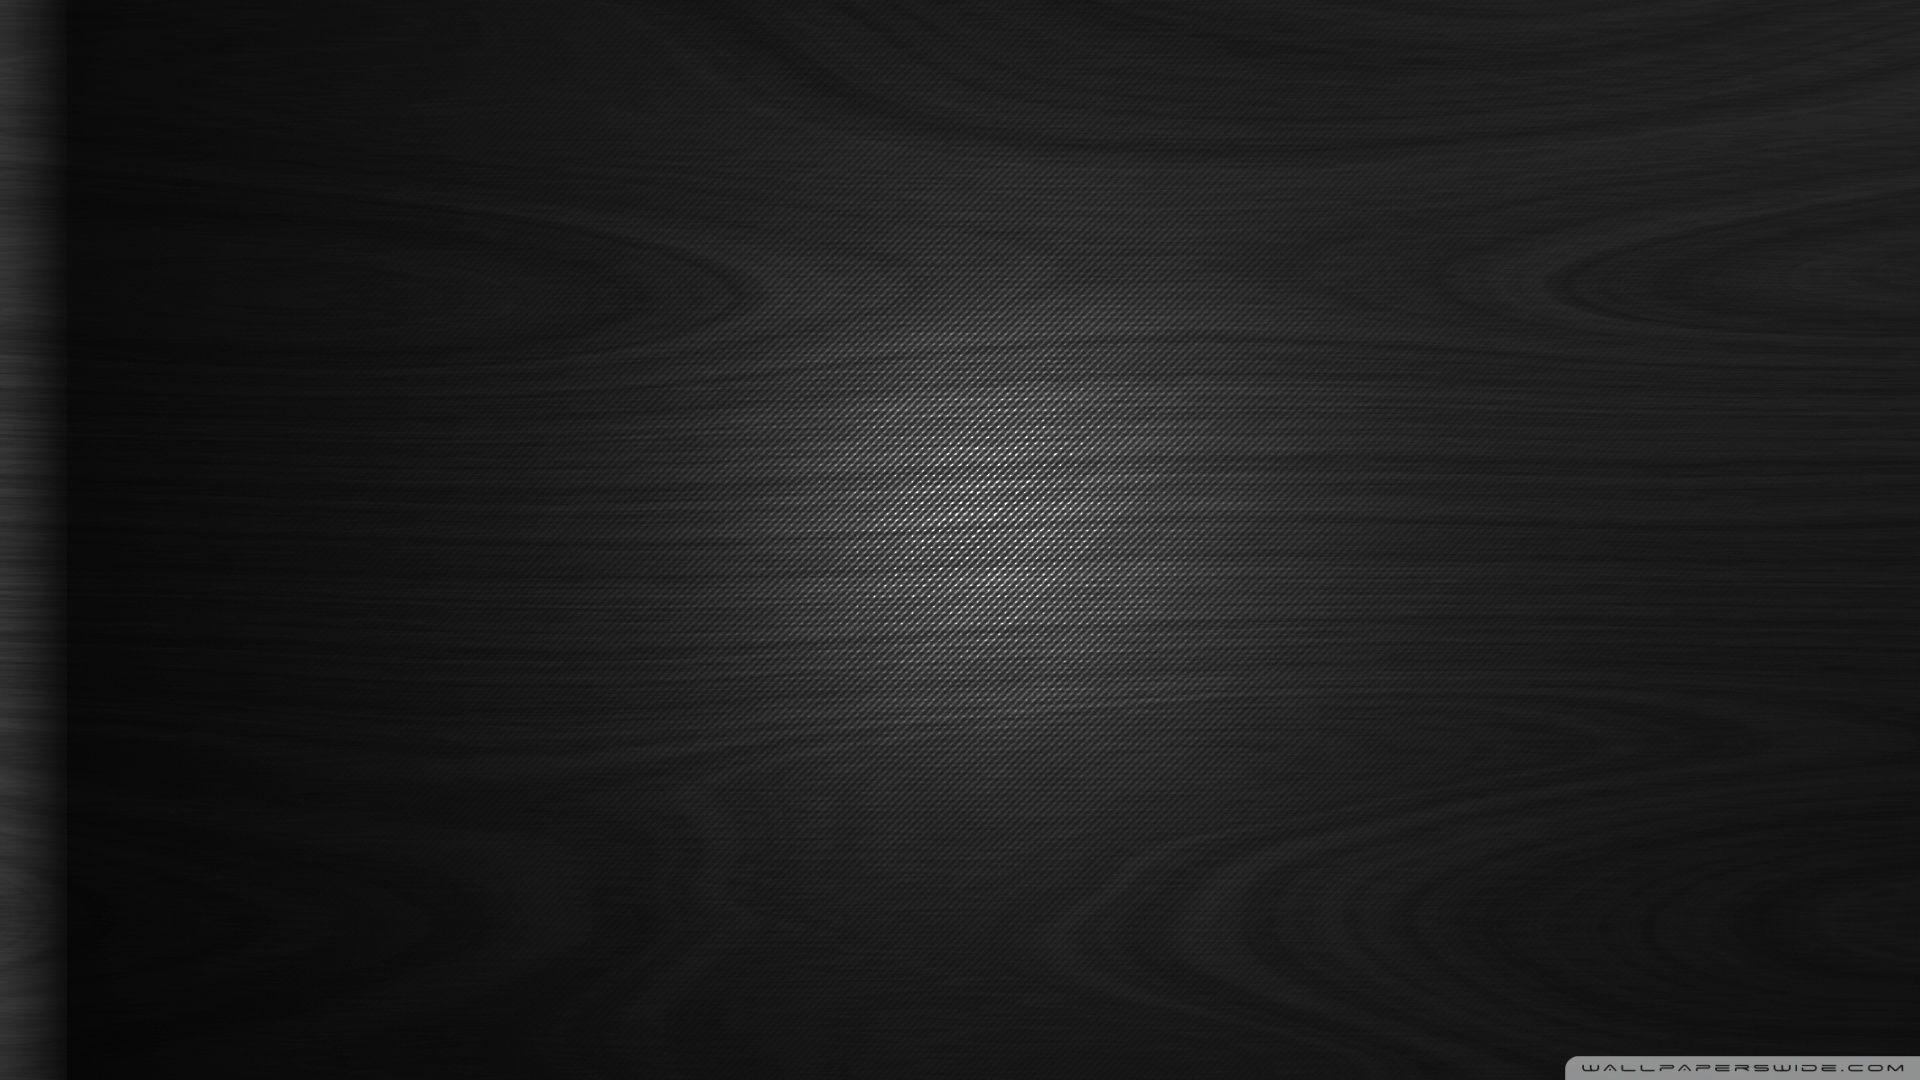 wood wallpapers 1080p wallpaper cave. Black Bedroom Furniture Sets. Home Design Ideas